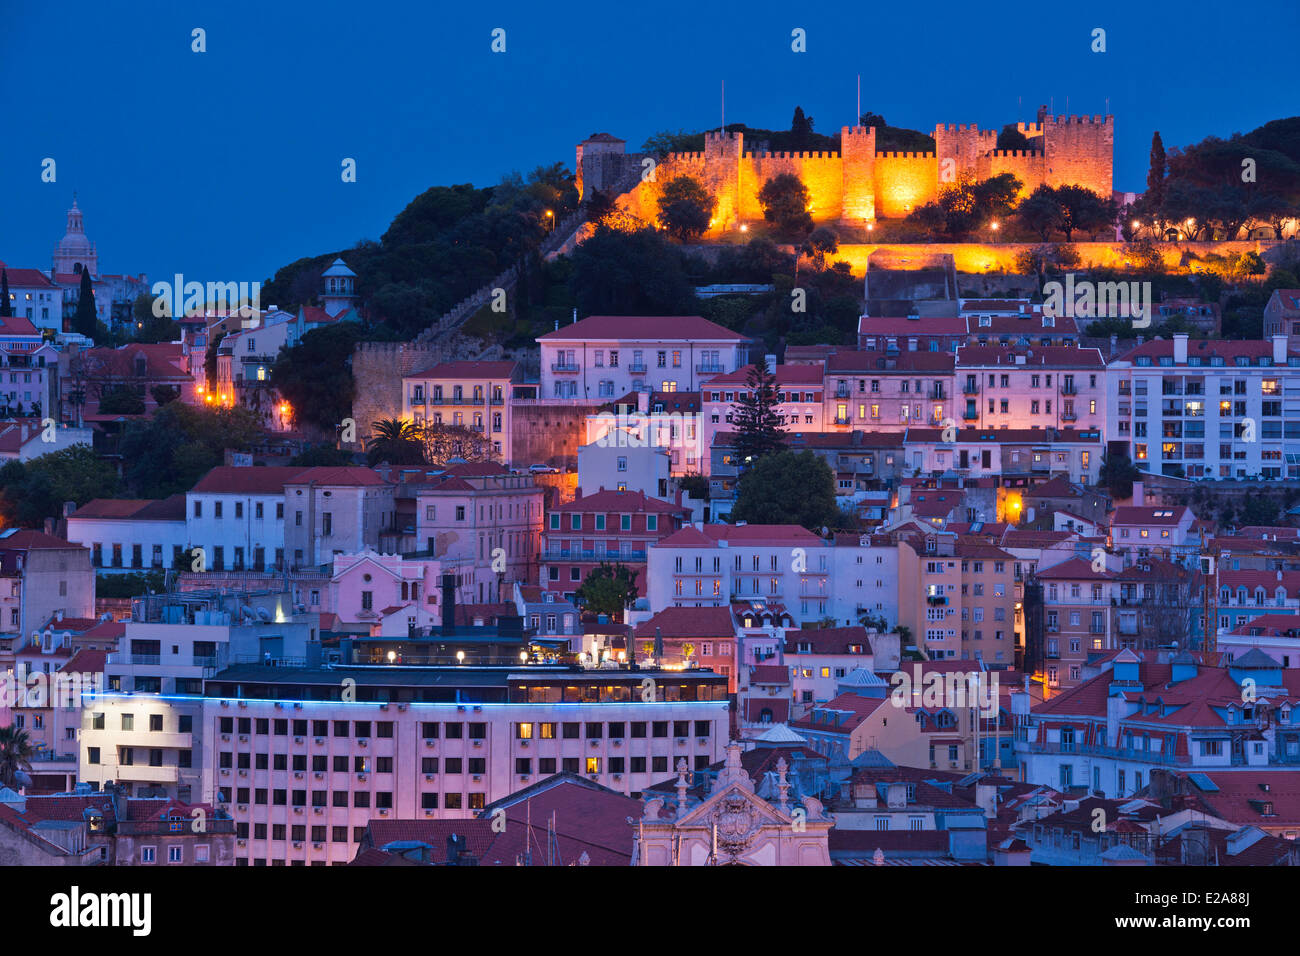 Portugal, Lisbon, panorama from the viewpoint Sao Pedro de Alcantara, the castle Sao Jorge overlooks the city - Stock Image